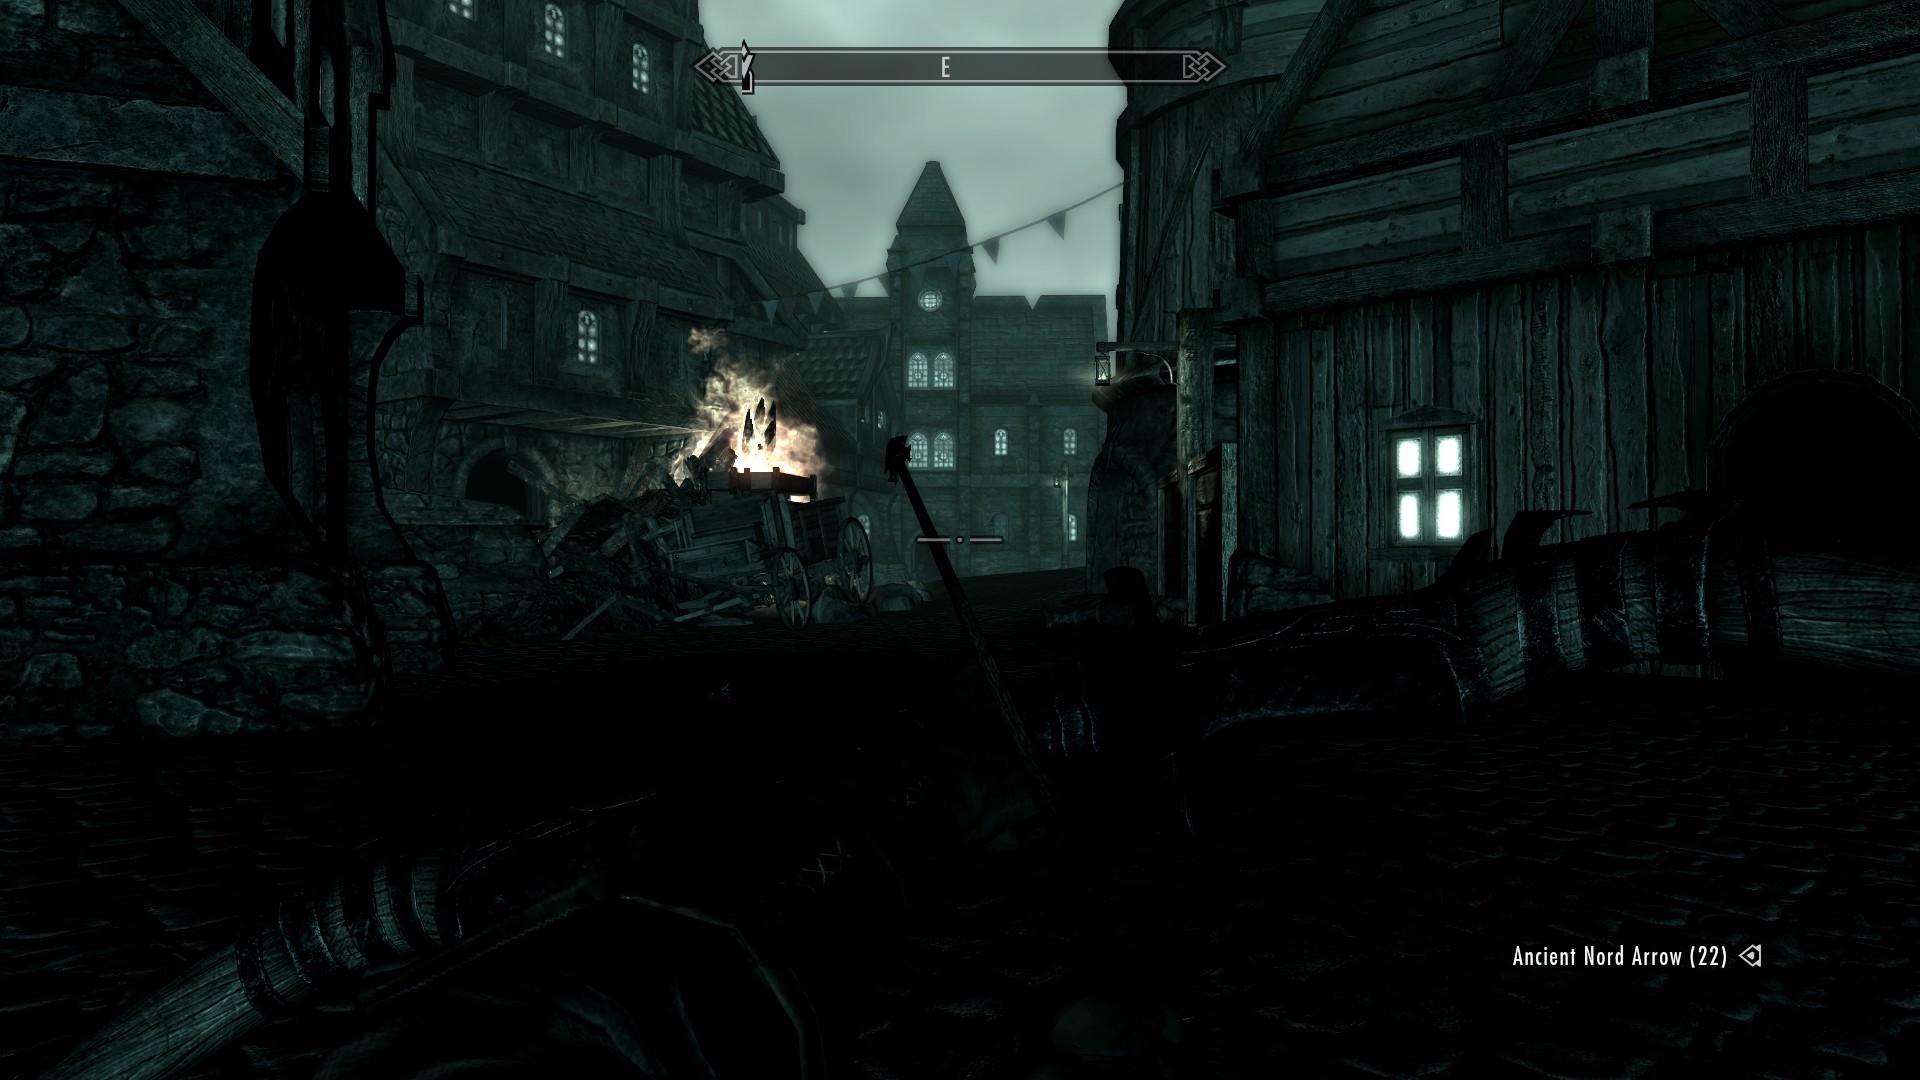 The Elder Scrolls Megathread XVIII: The Wait For TES VI